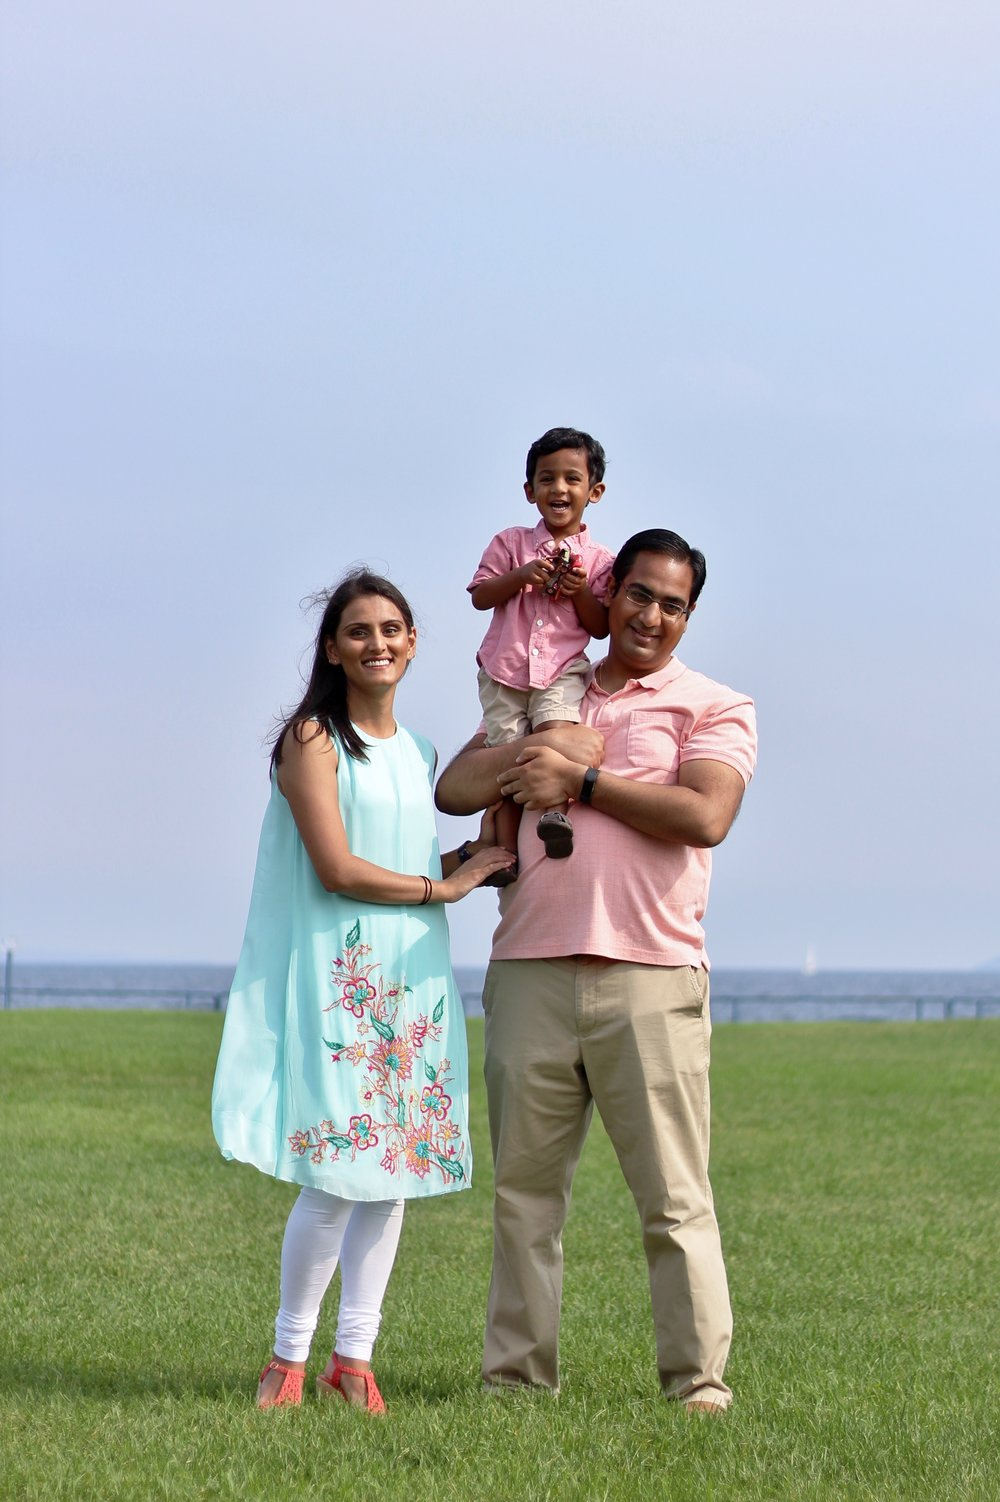 Patel Family Traverse City August 2018 (8).JPG